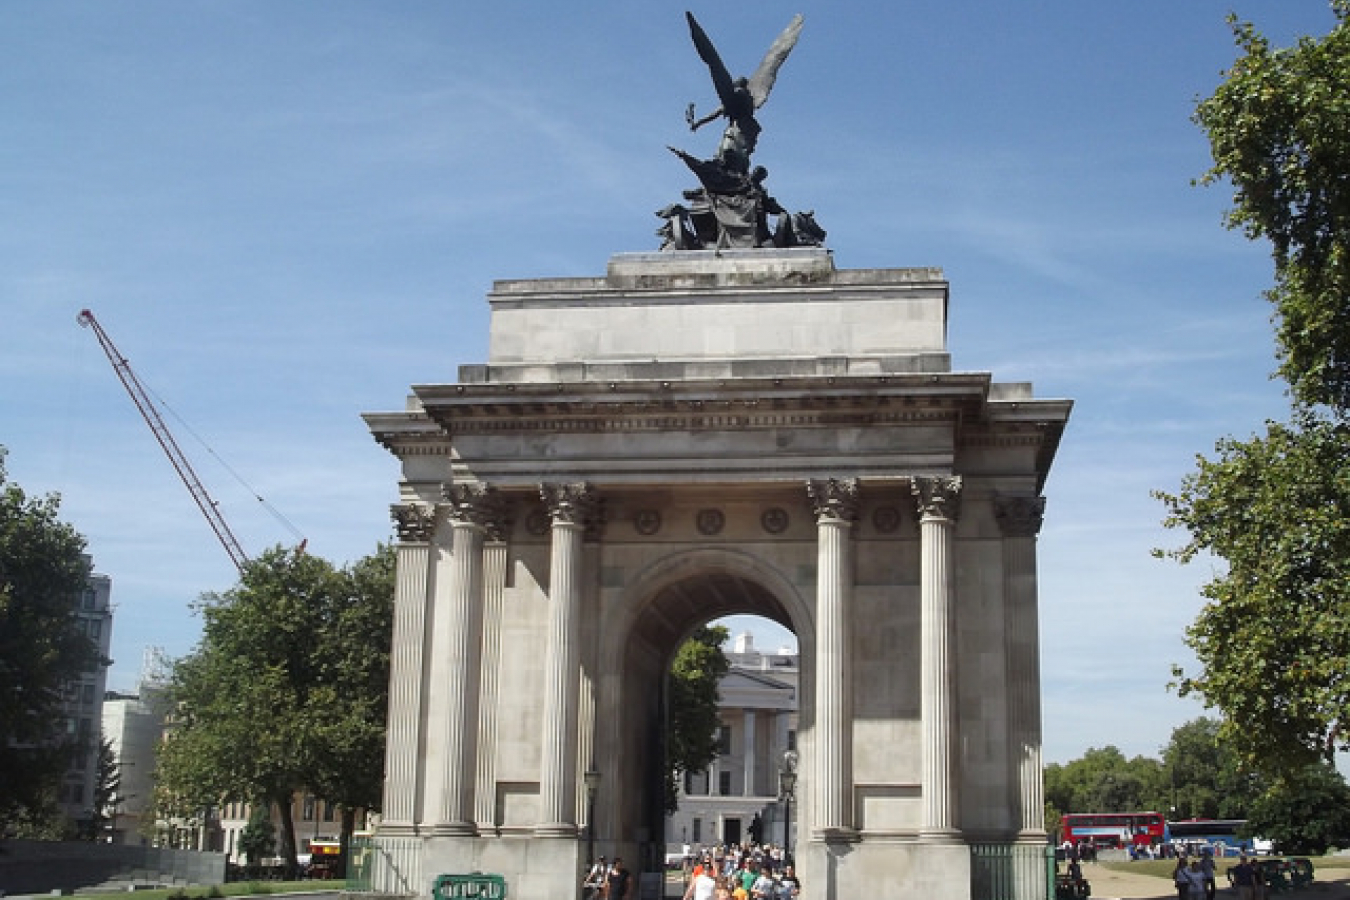 Wellington Arch - Hyde Park Corner, London